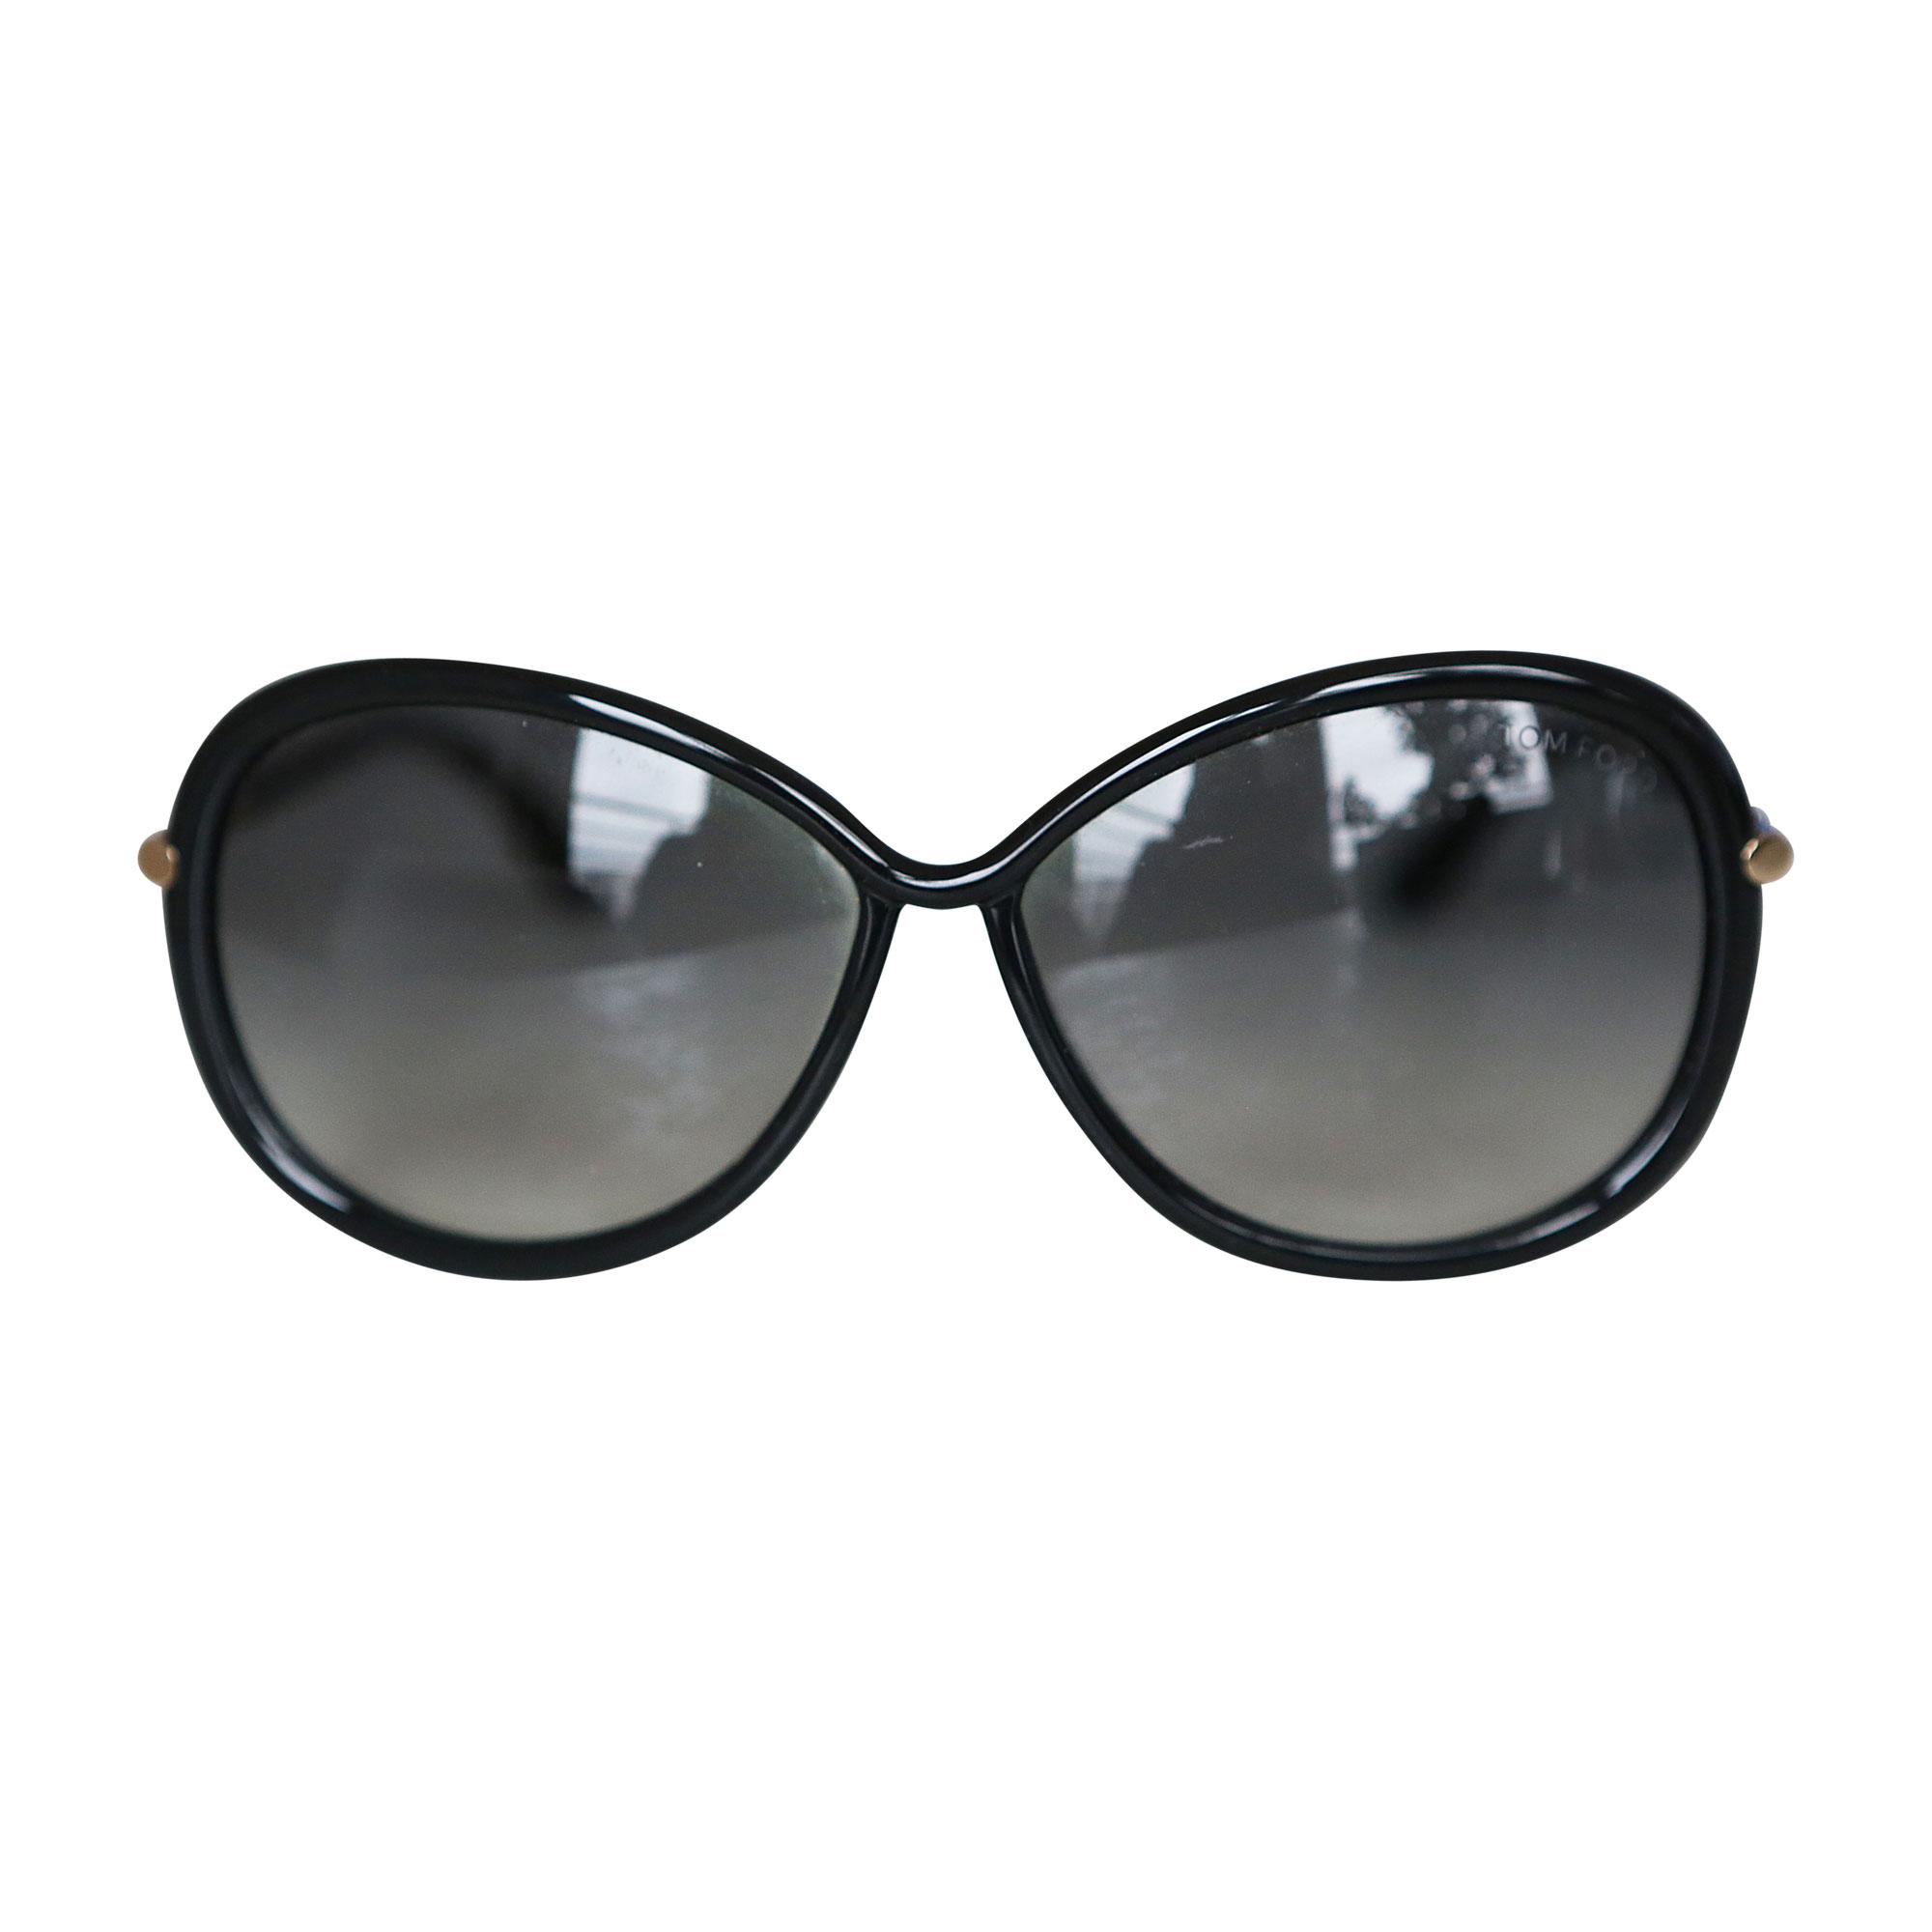 1a2ecba9a8c9a8 ... Lunettes de soleil TOM FORD Noir Tom Ford TF0149 Ramone - T58 - Noir - Roviex  Lens ...